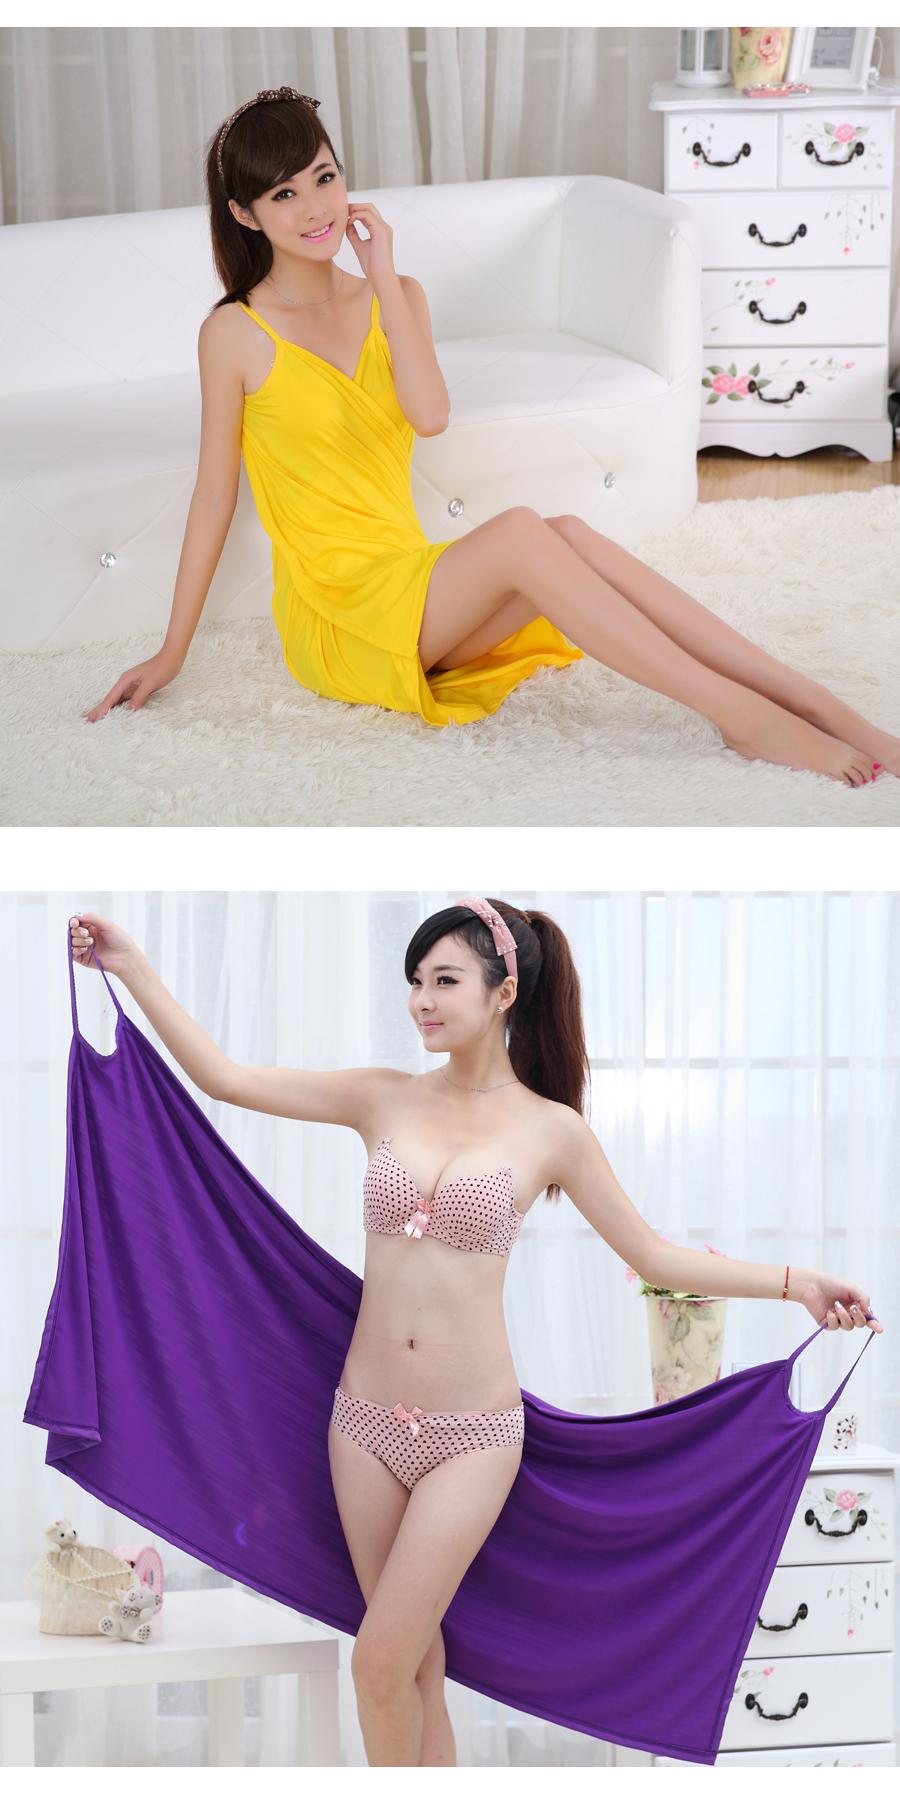 Honana BX-376 Summer Beach Soft Ice Silk Sexy Hot Able Wear Deep V Spa BathRobe Bath Towel Women Skirt